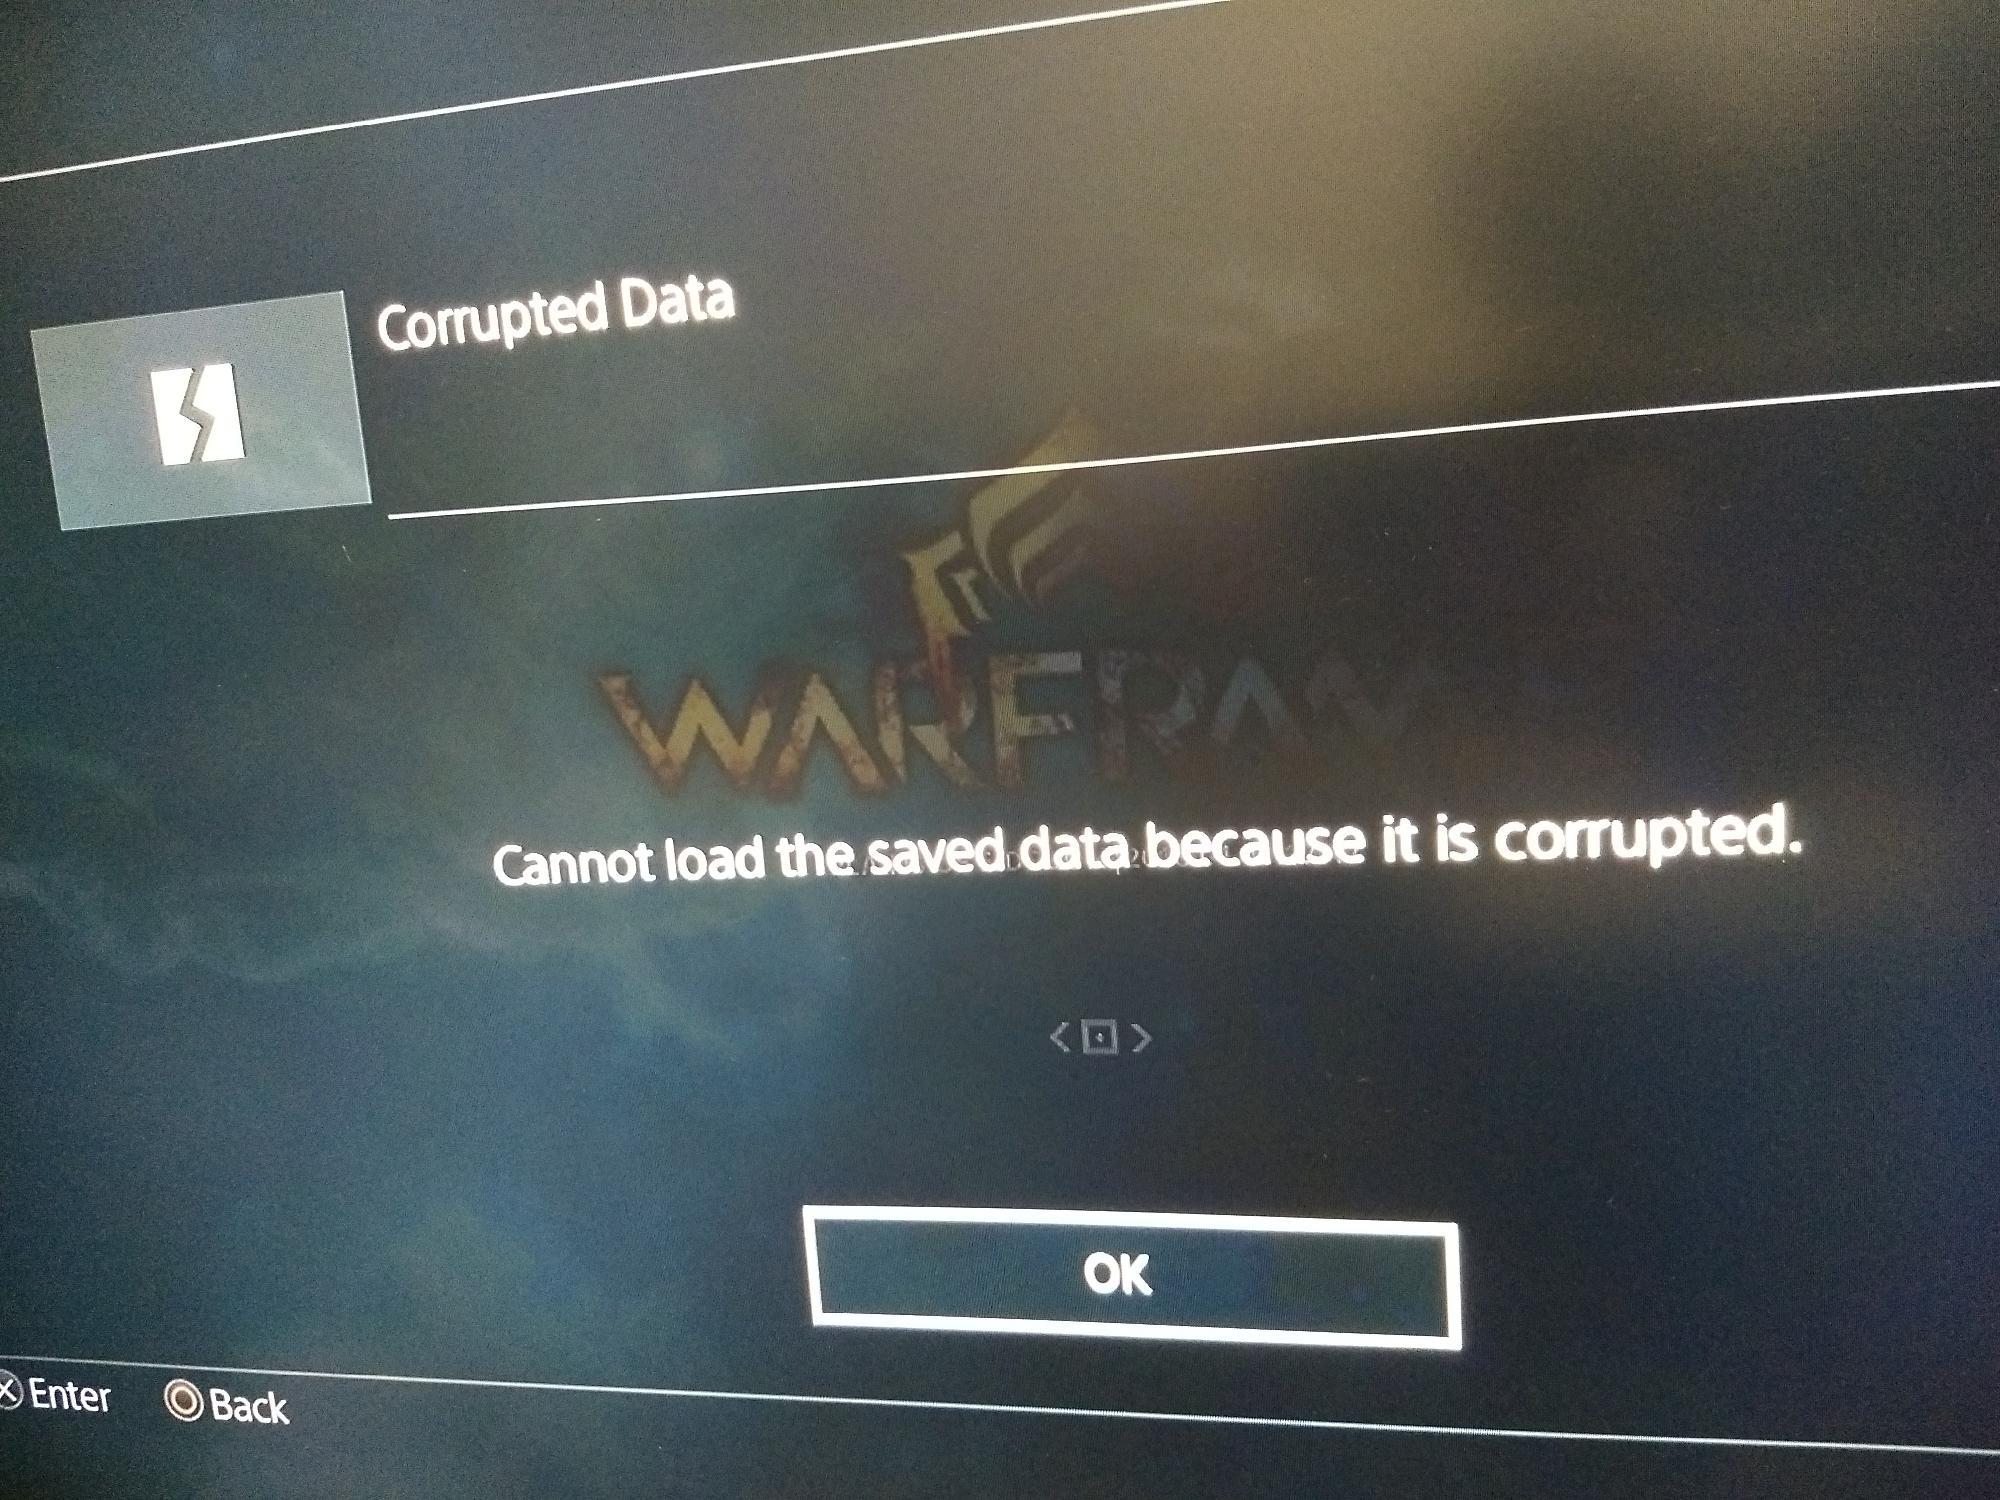 PS4 Corrupted Data | FANDOM